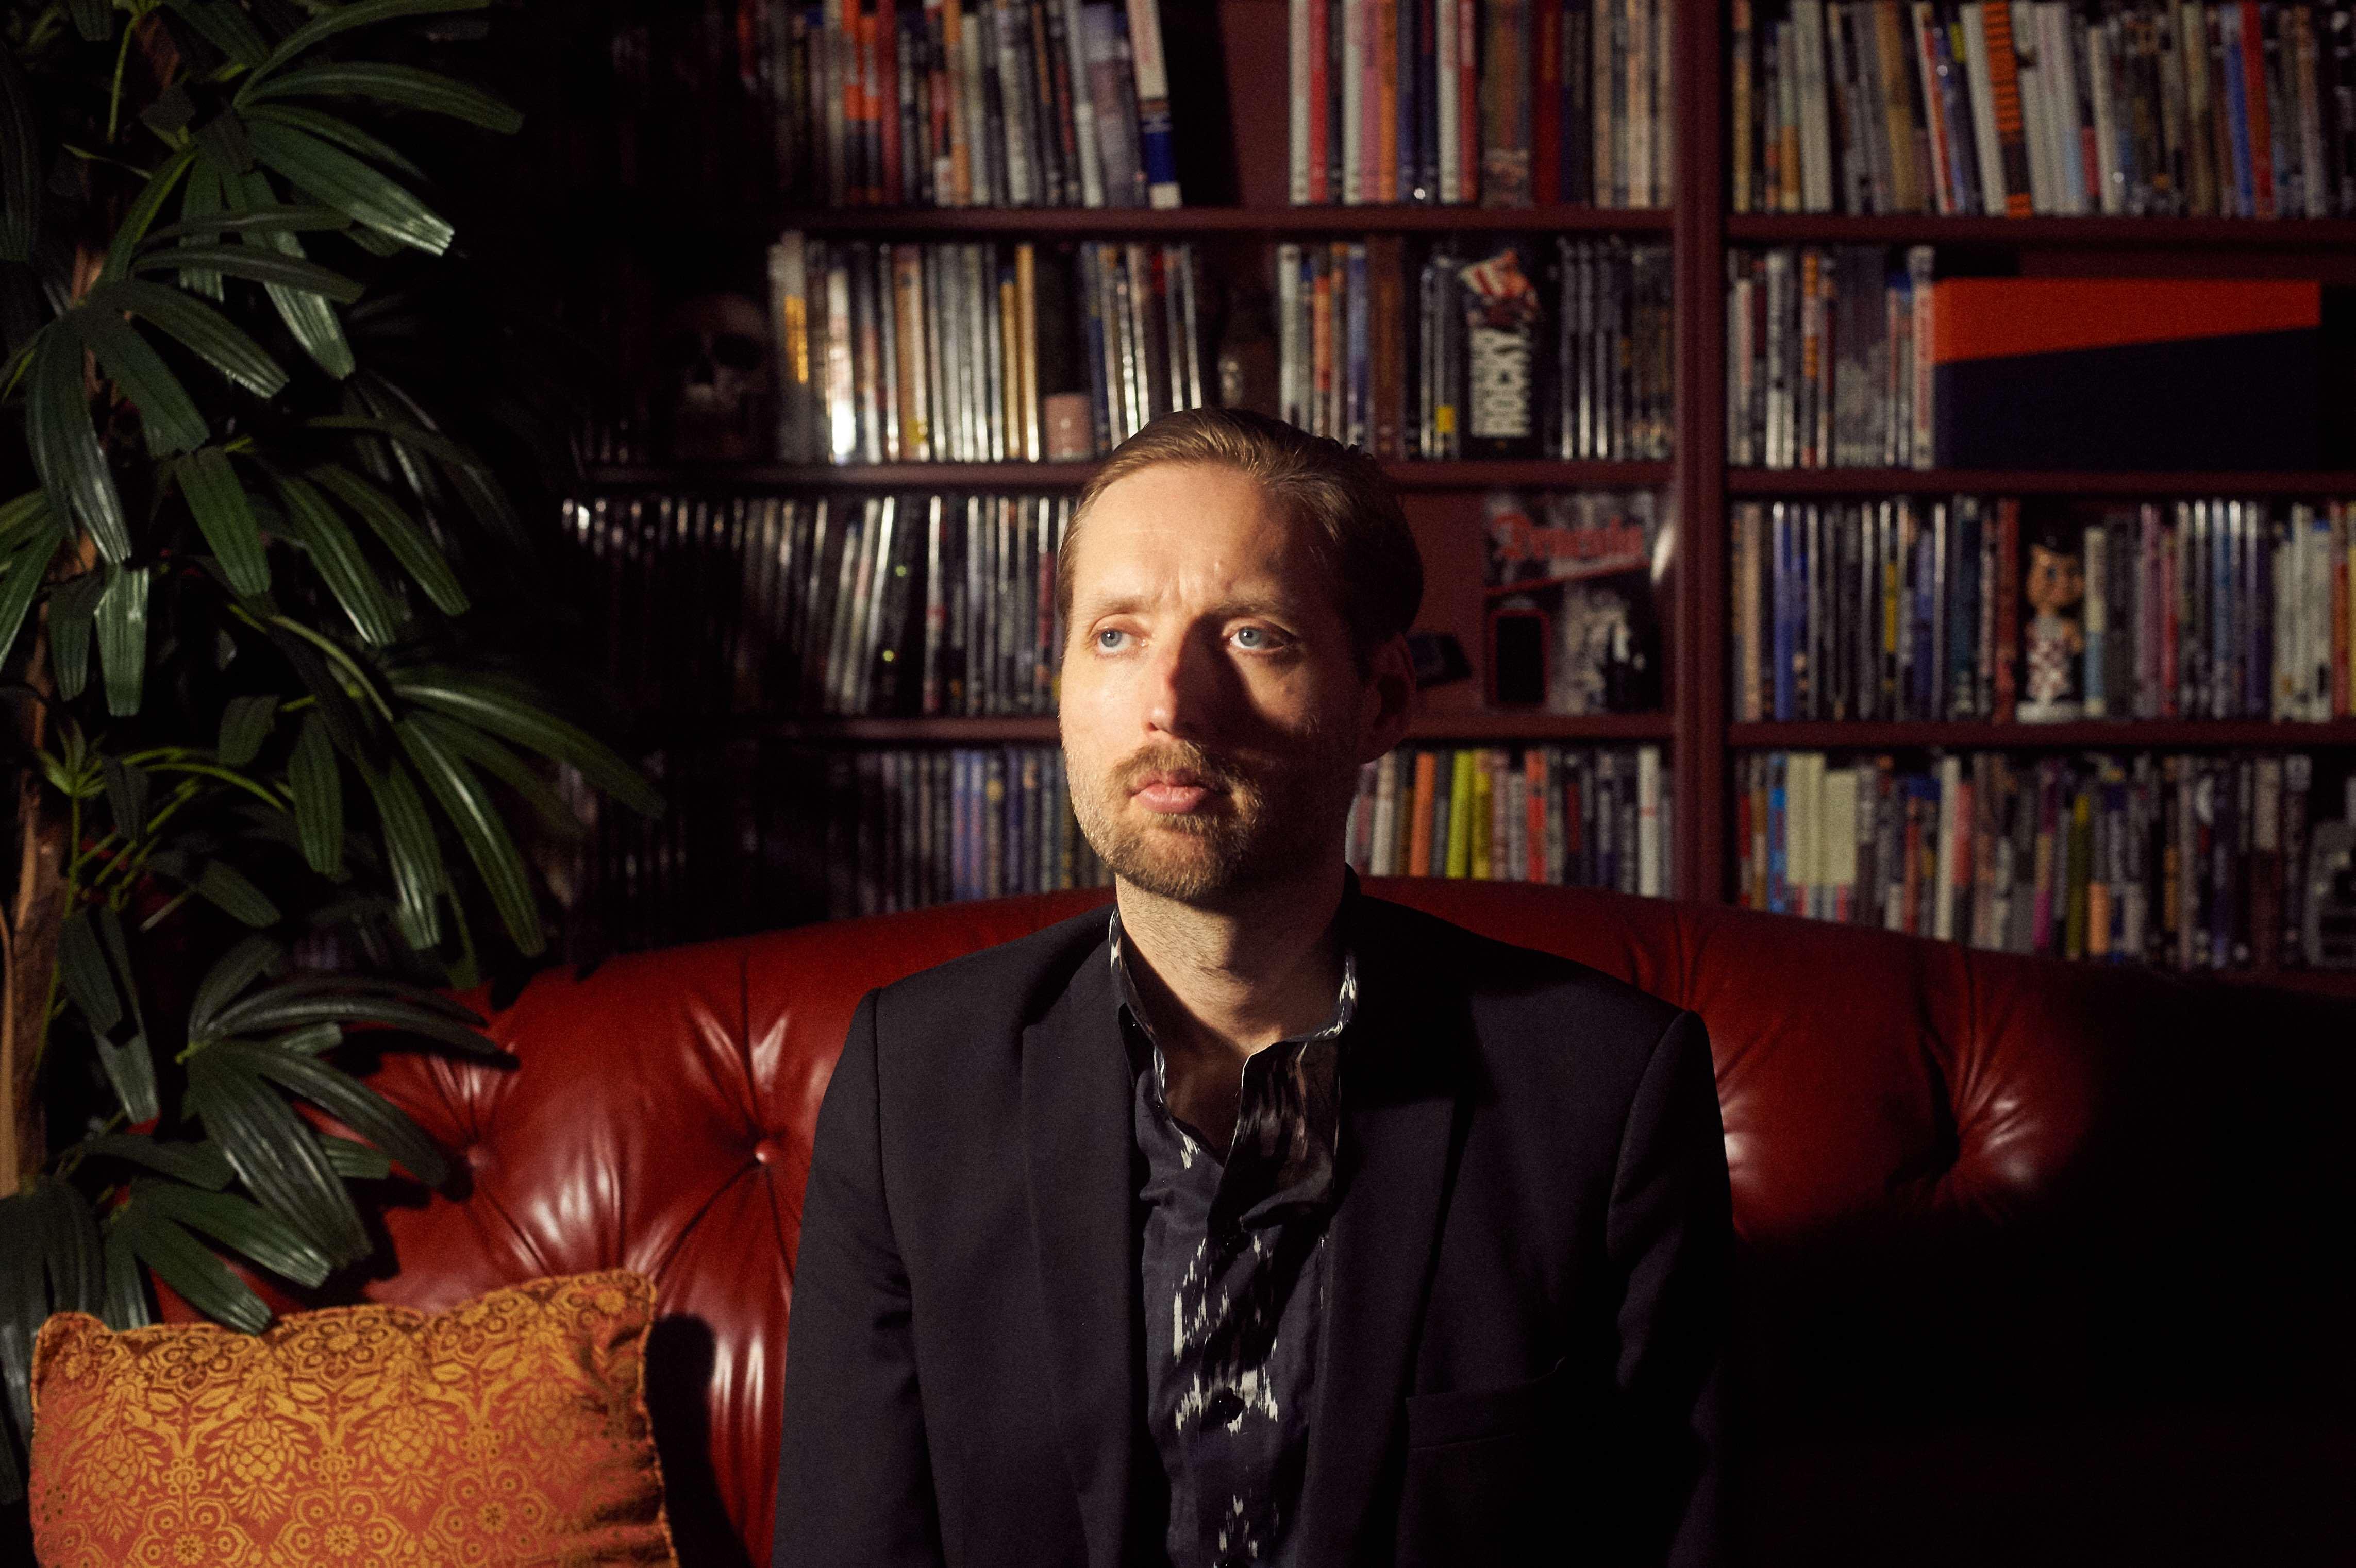 Mark Stoermer